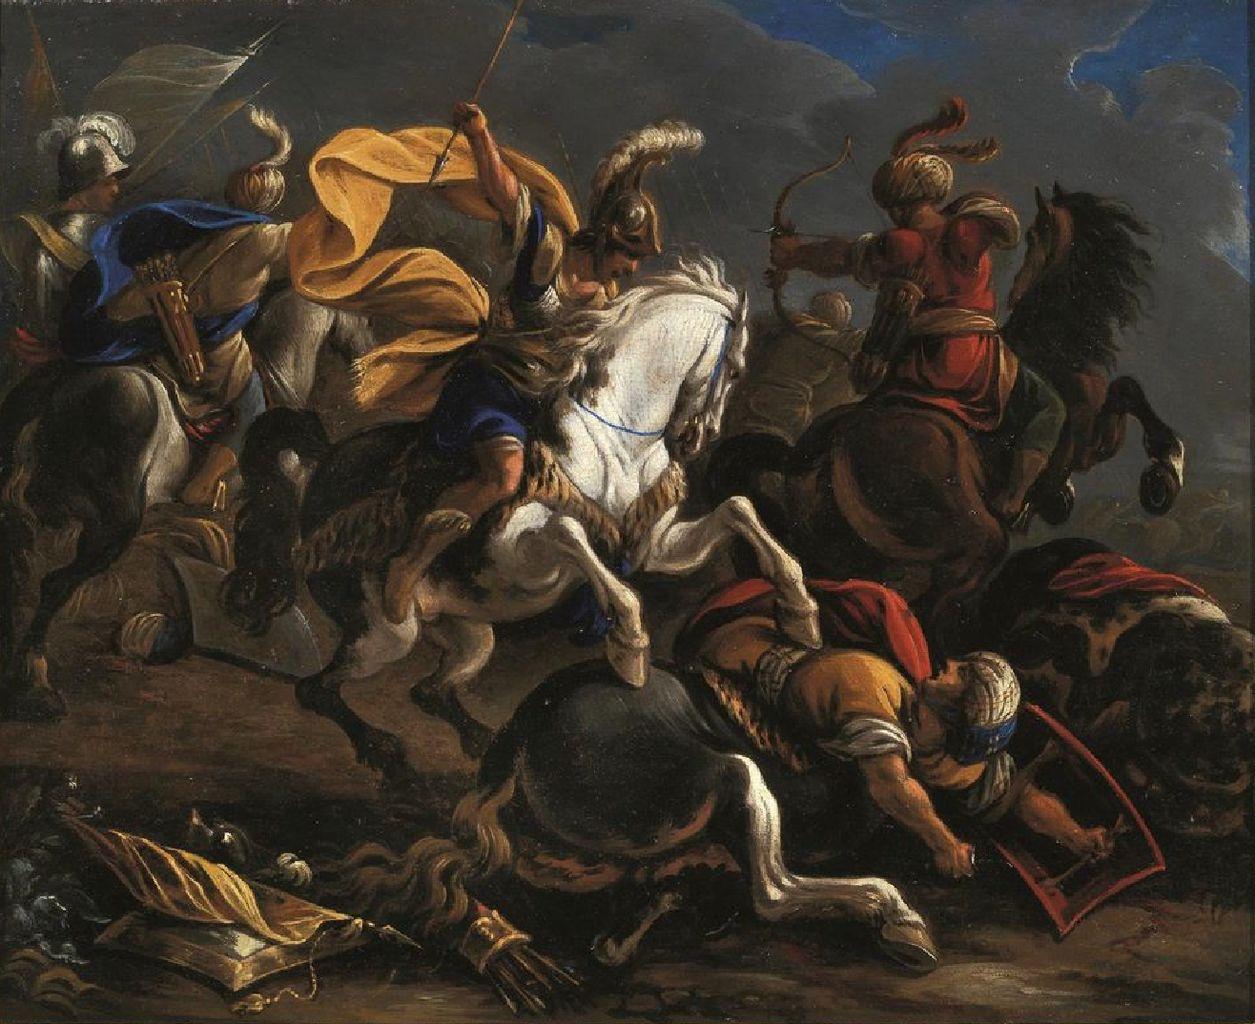 Cavalry battle between Turkishs and Christians, cr. 1610-1675, Vincent Adriaenssen, Flemish/Italian